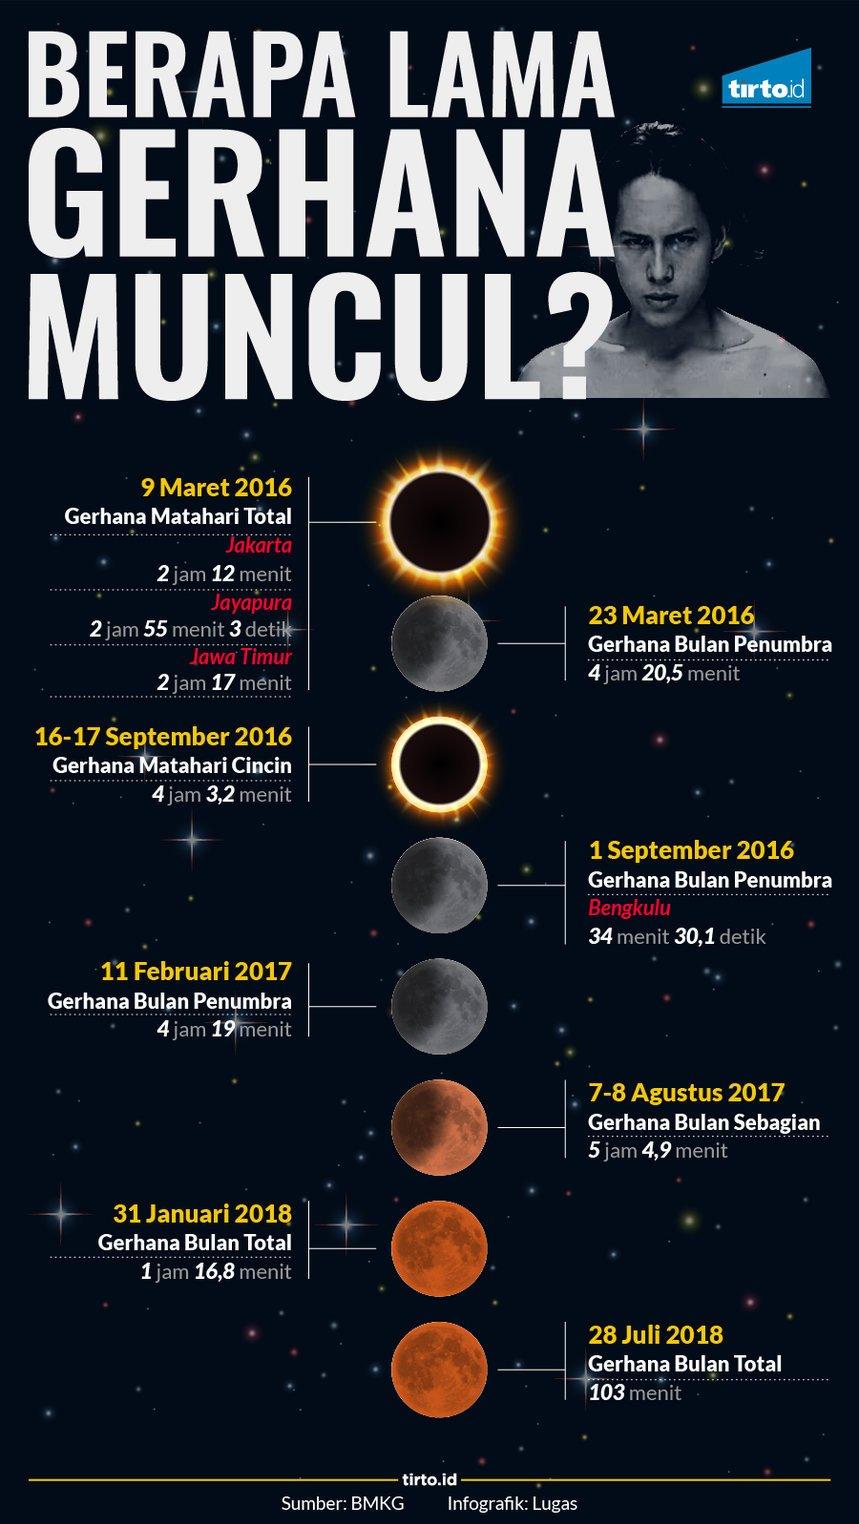 Kenapa Bisa Terjadi Gerhana Matahari : kenapa, terjadi, gerhana, matahari, Berapa, Gerhana, Muncul?, Infografik, Tirto.ID